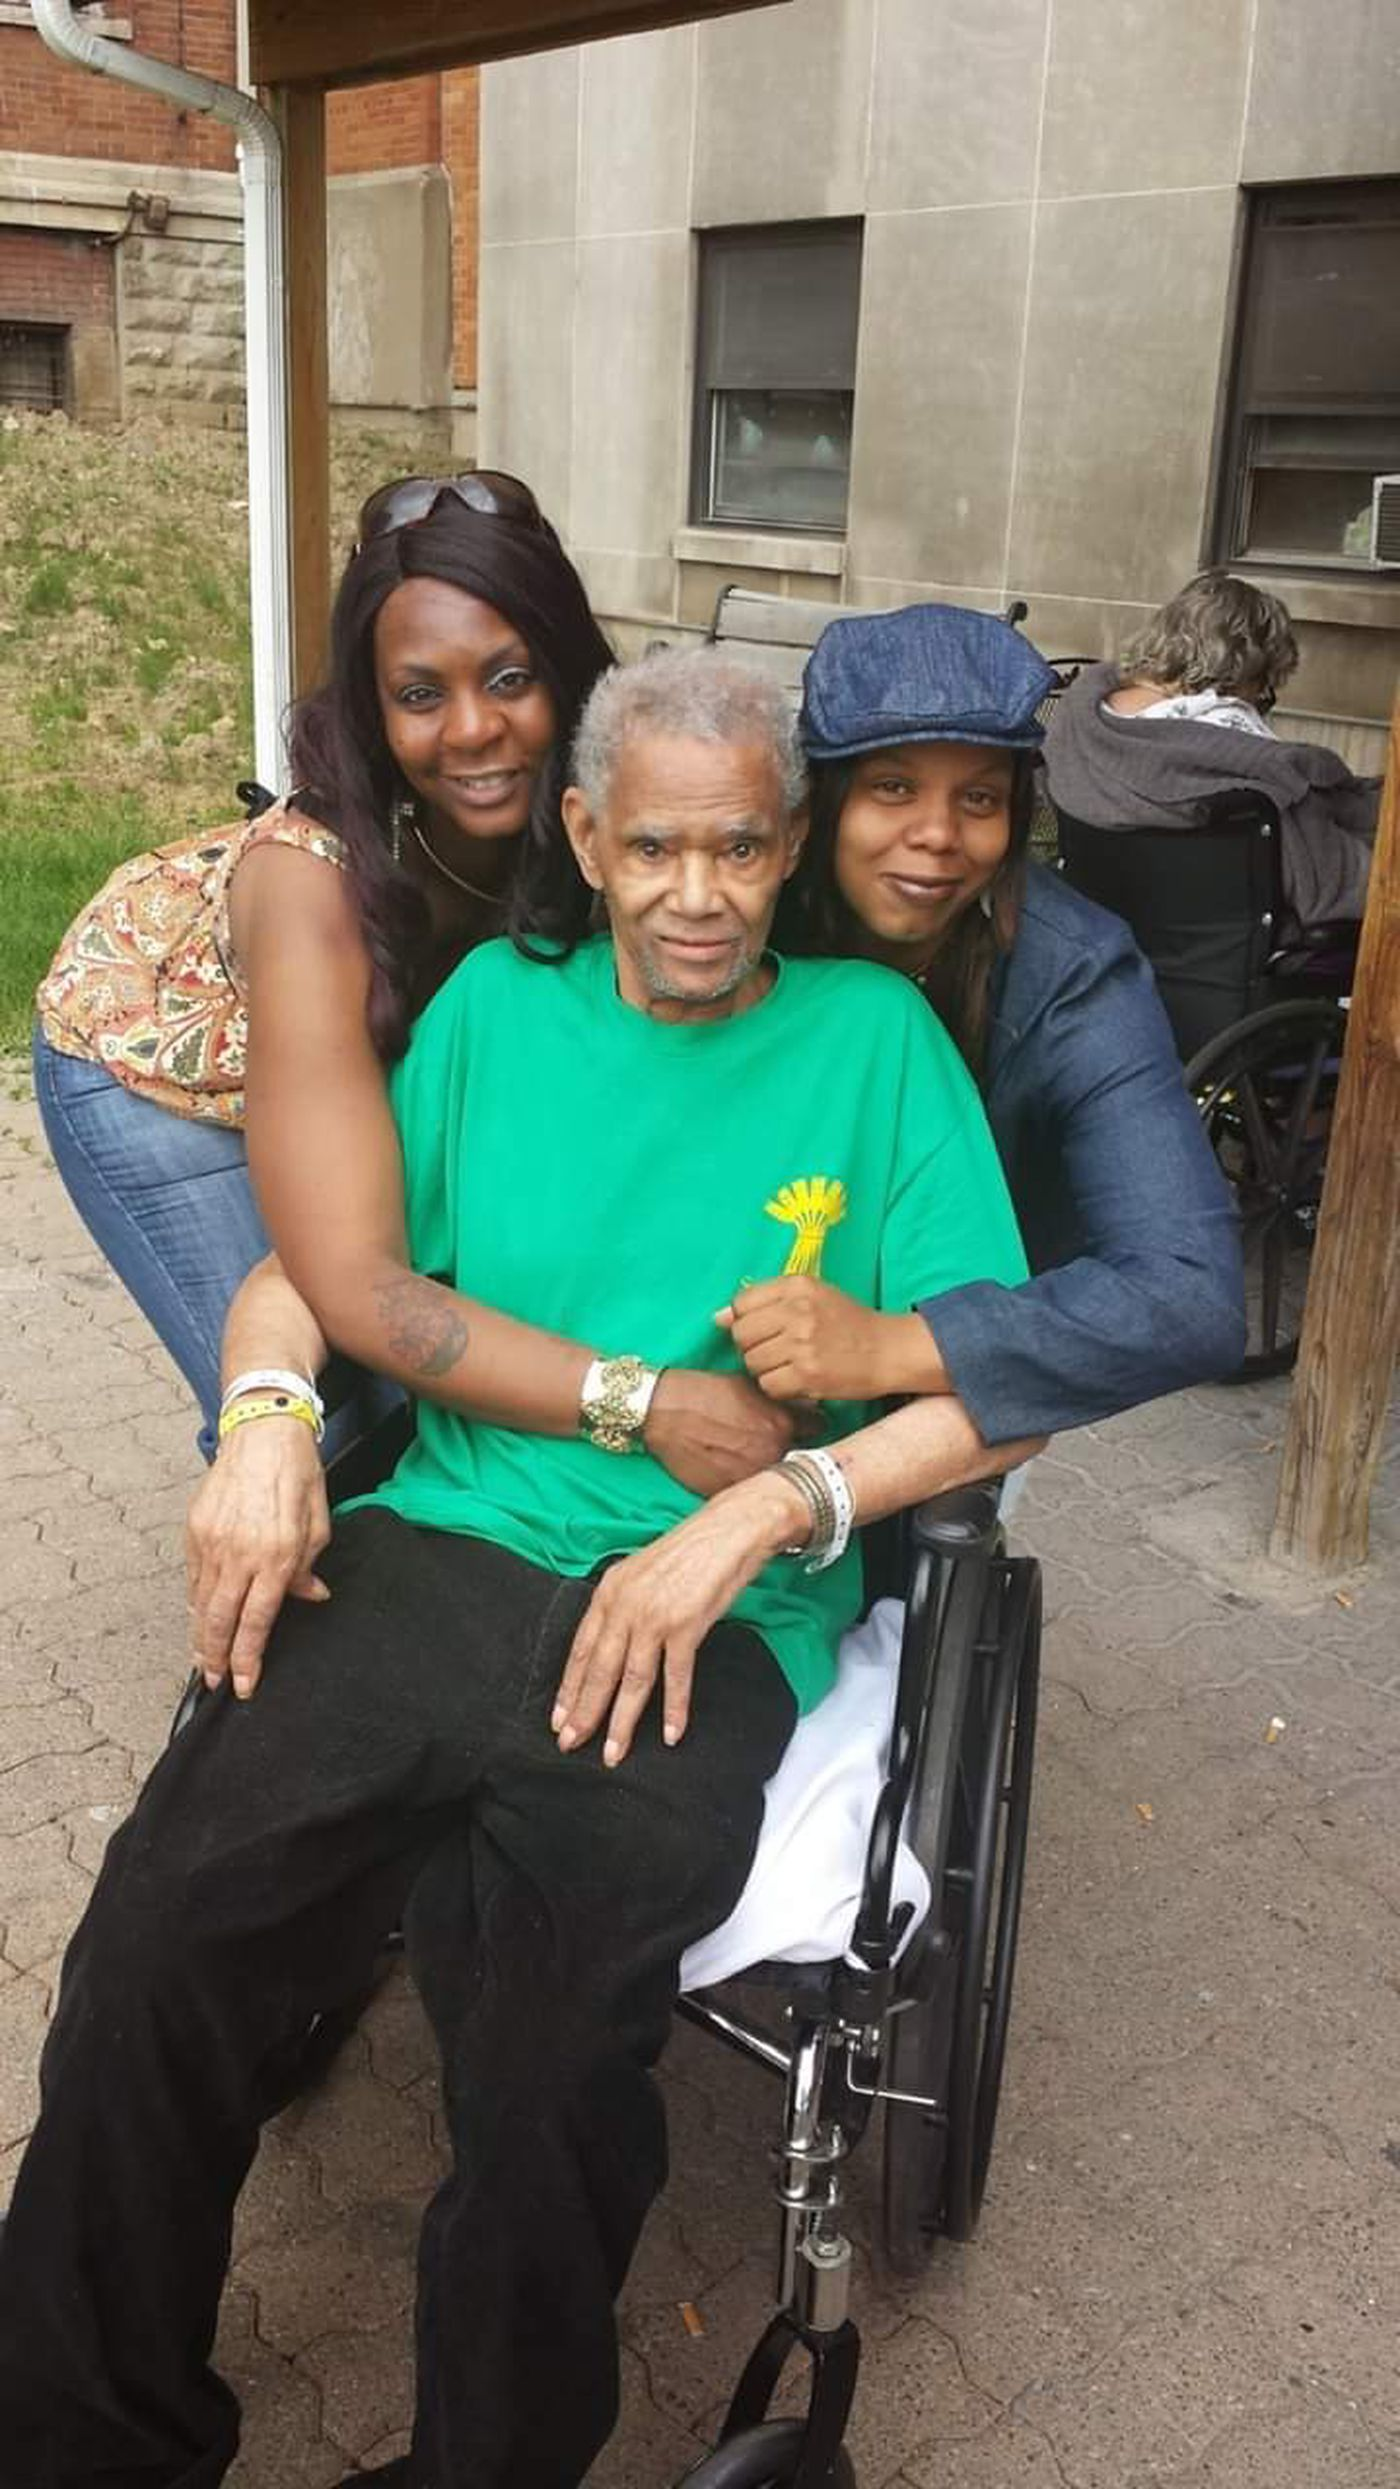 paul tyler dies in nursing home and nobody tells the family